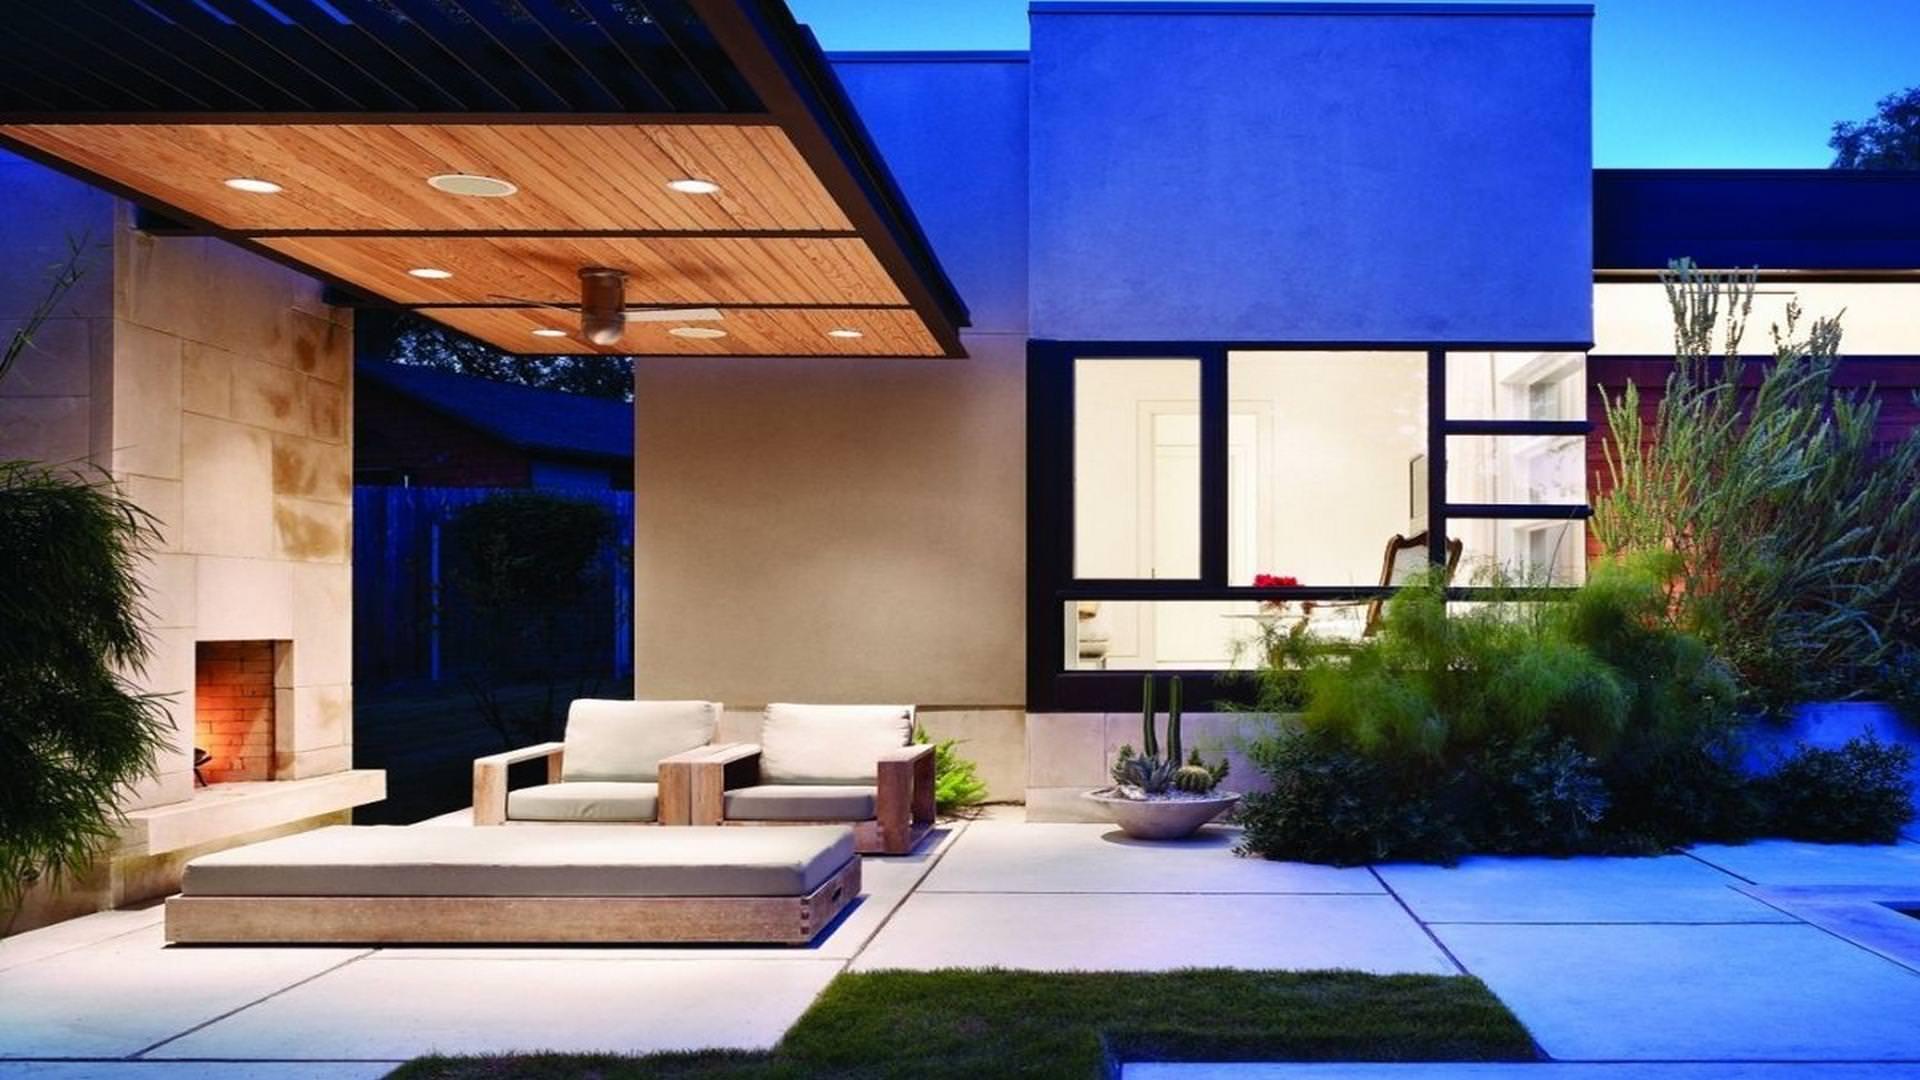 22 Modern Home Designs Decorating Ideas  Design Trends  Premium PSD Vector Downloads